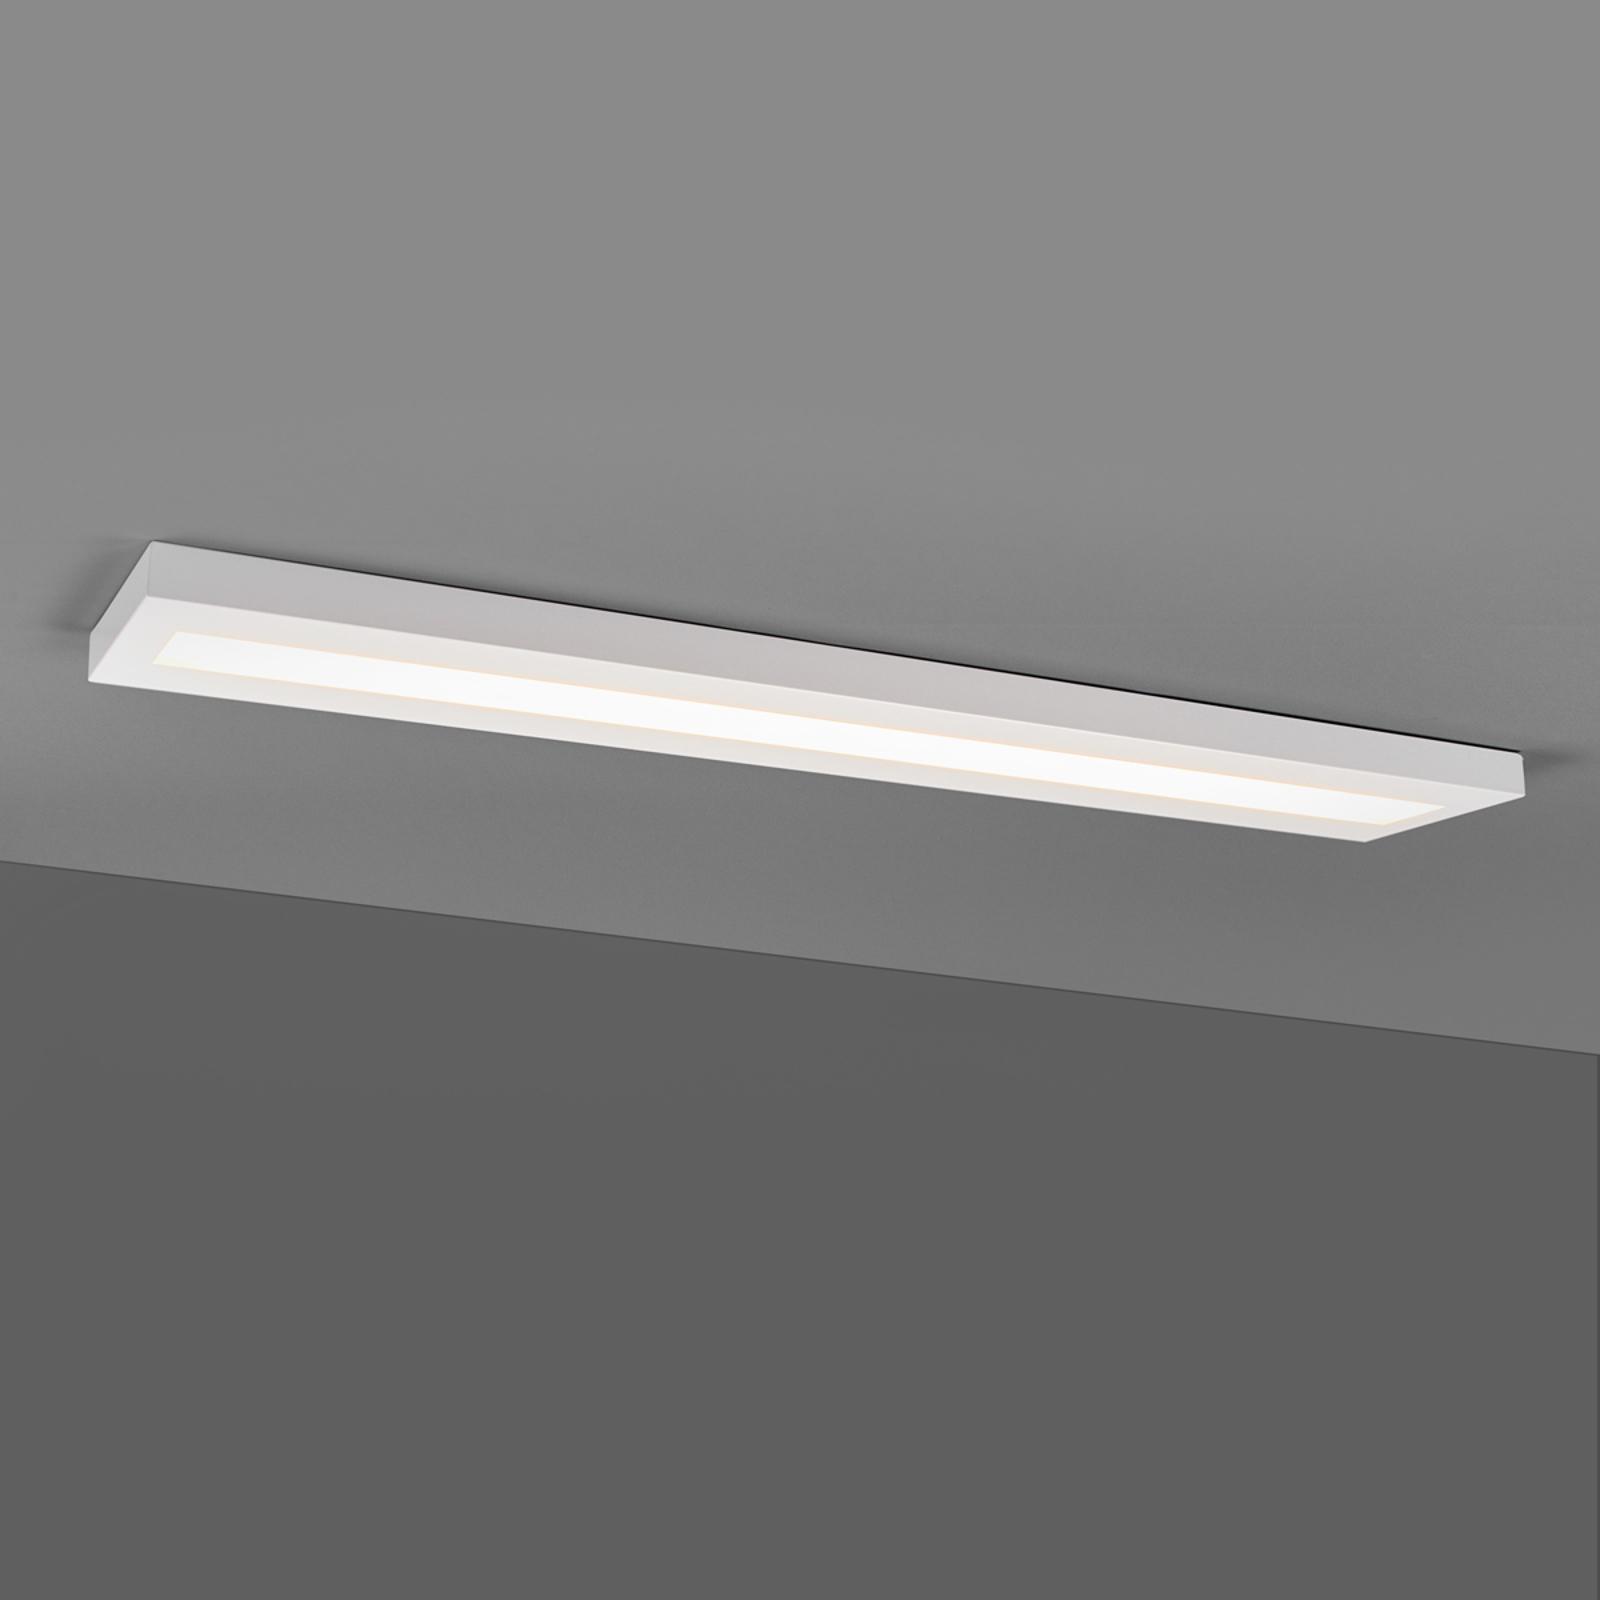 LED-taklampa 33 W vit, BAP